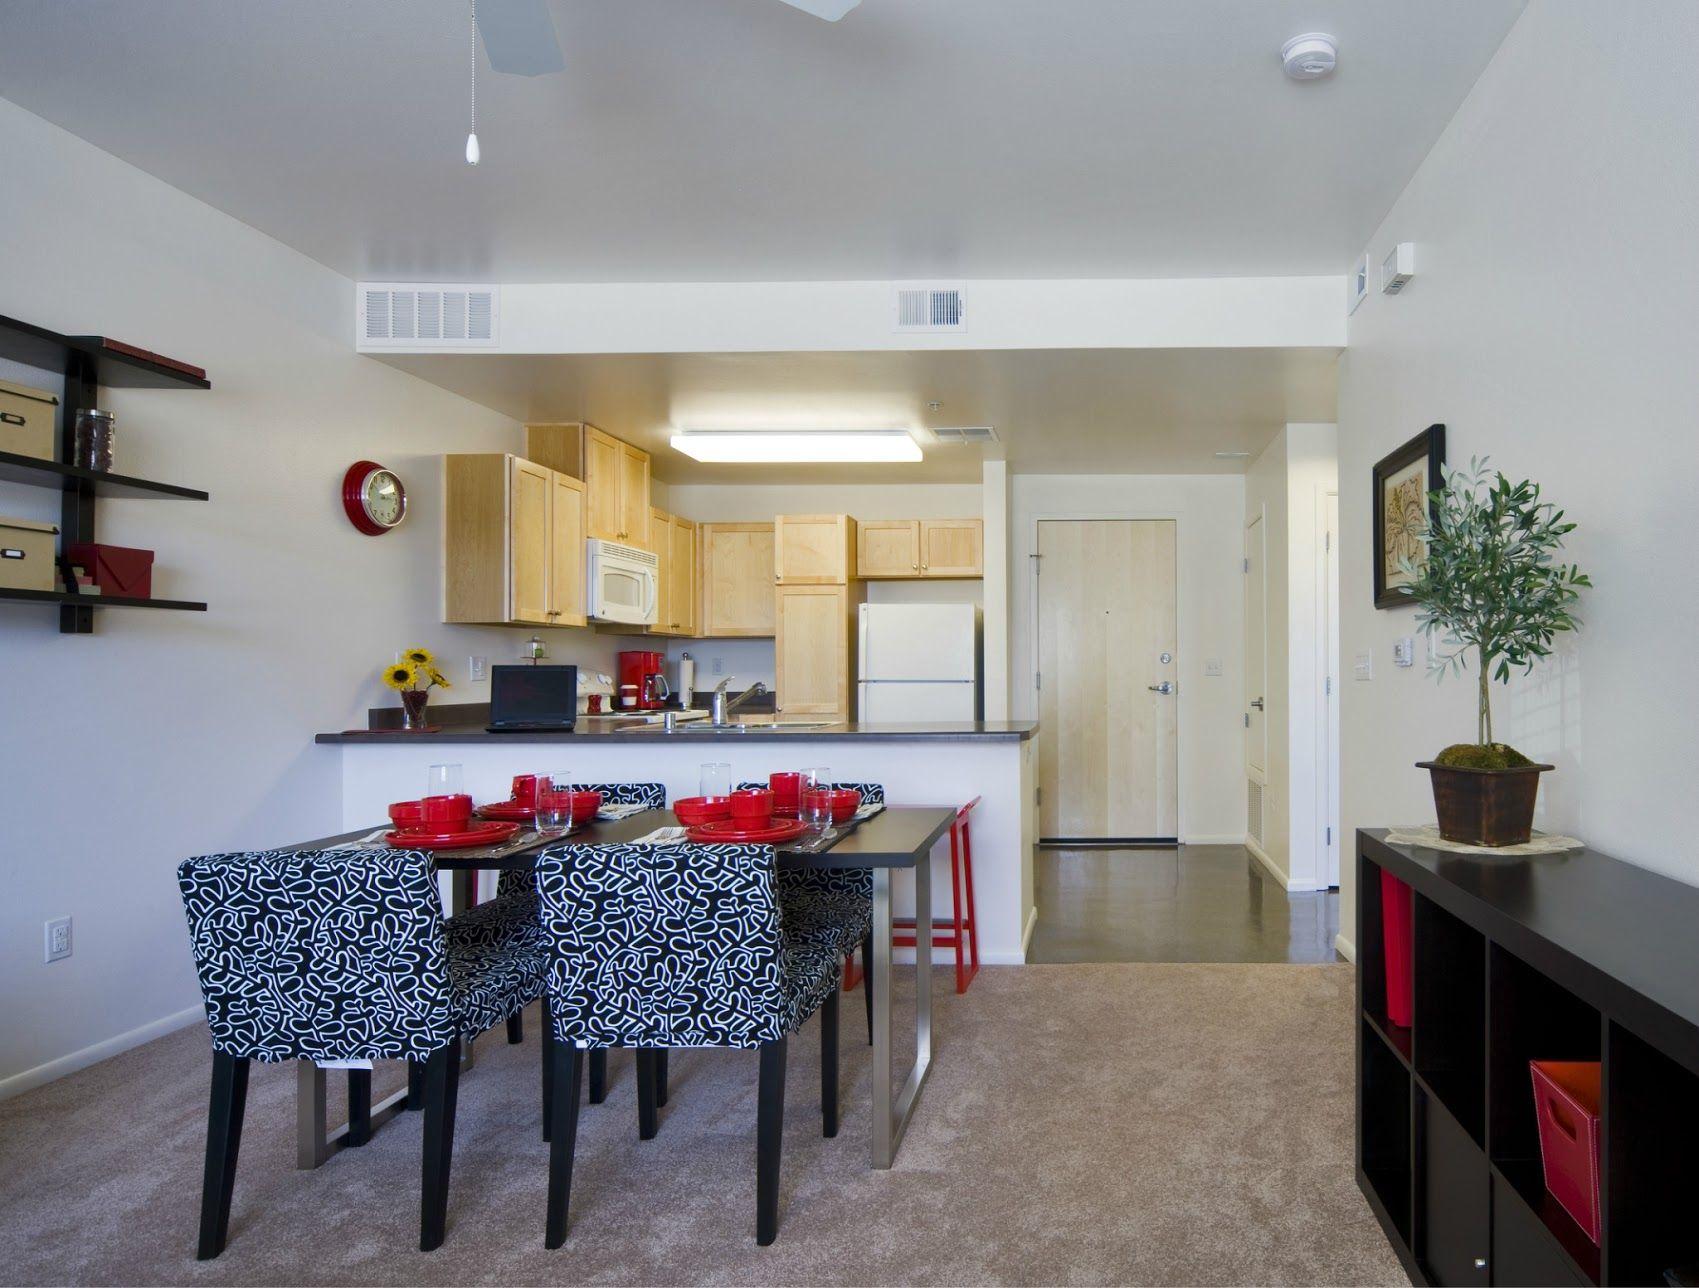 Silver Gardens Apartments Albuquerque Nm Affordable Housing Apartment Garden Low Cost Housing